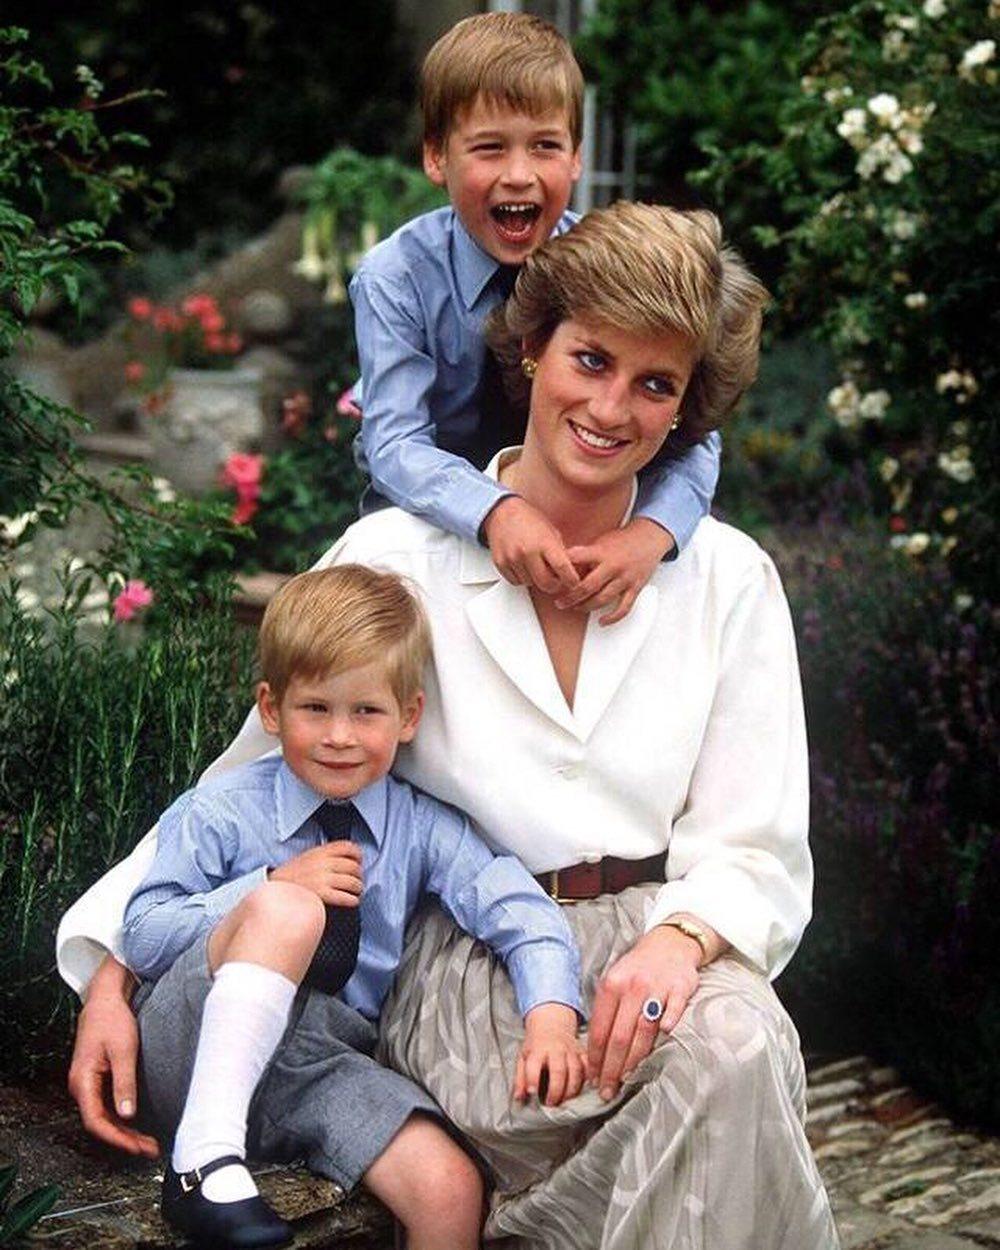 Princ Harry zavzpomínal na svou maminku, princeznu Dianu...